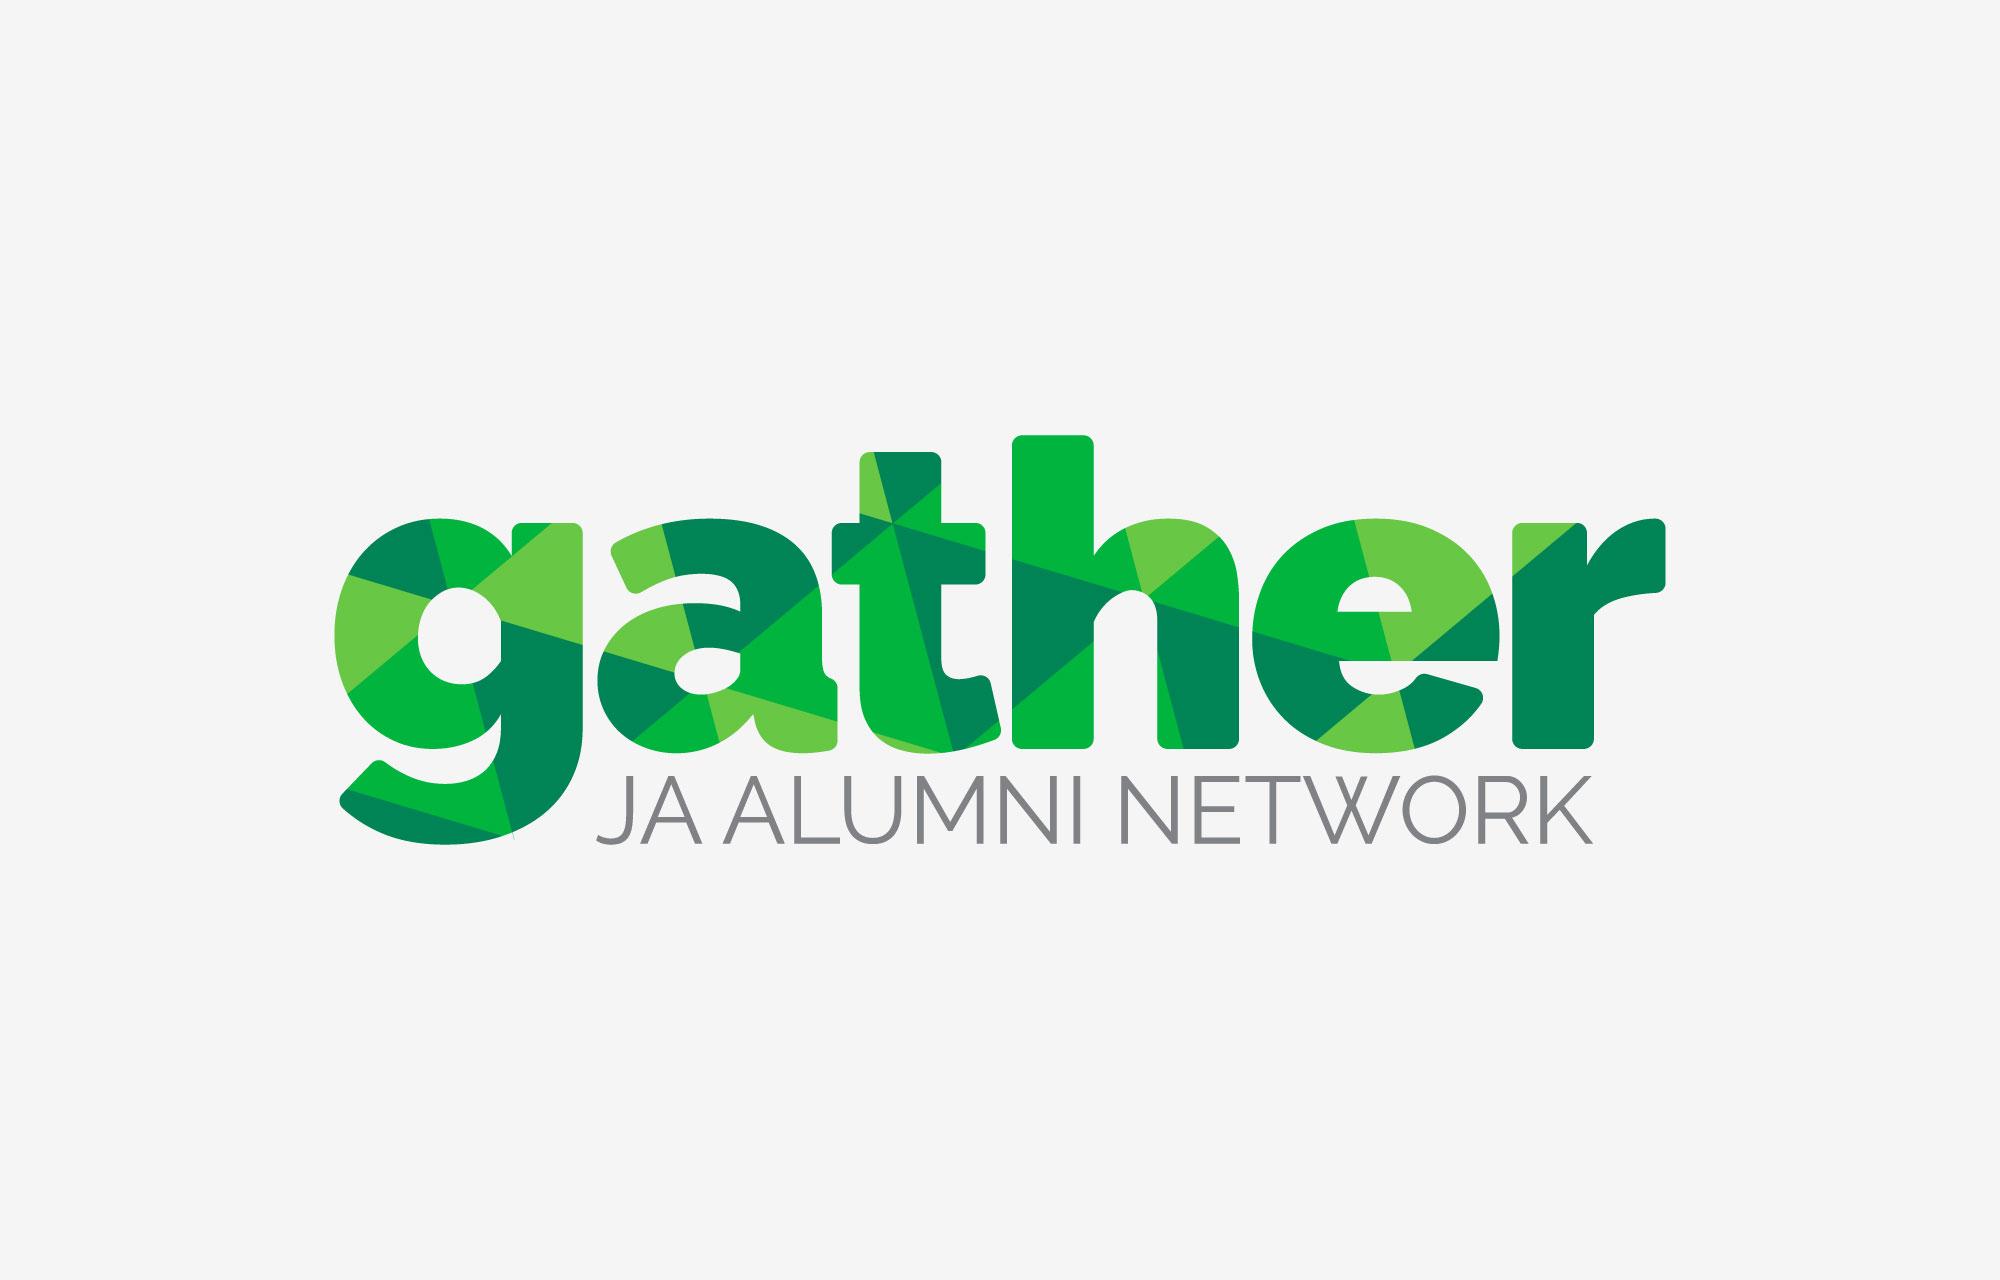 JA alumni on Gather… - 11,286 members in total550 members in the JA Alumni Europe group93,000+ page views since launch